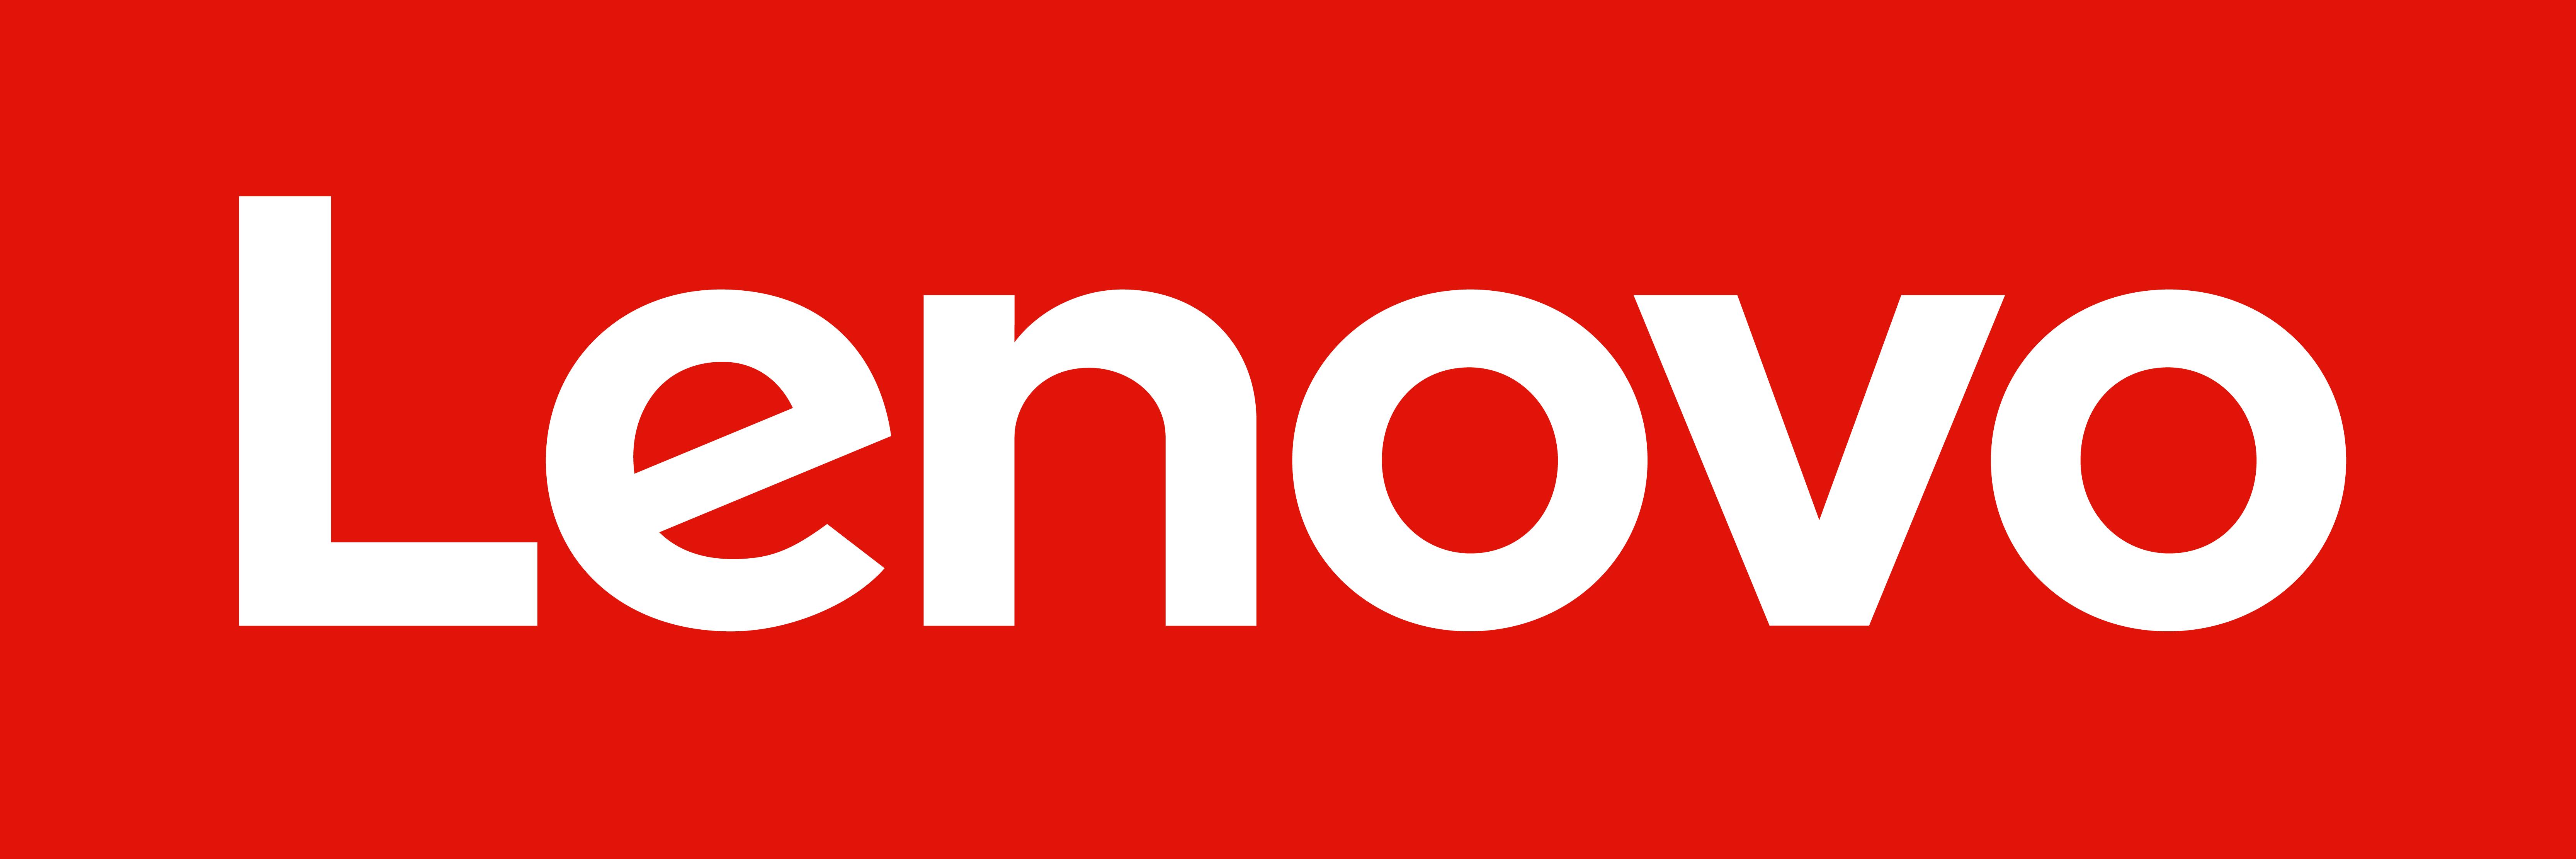 /images/com_odtatierkdunaju/teams/2020_Lenovo.png